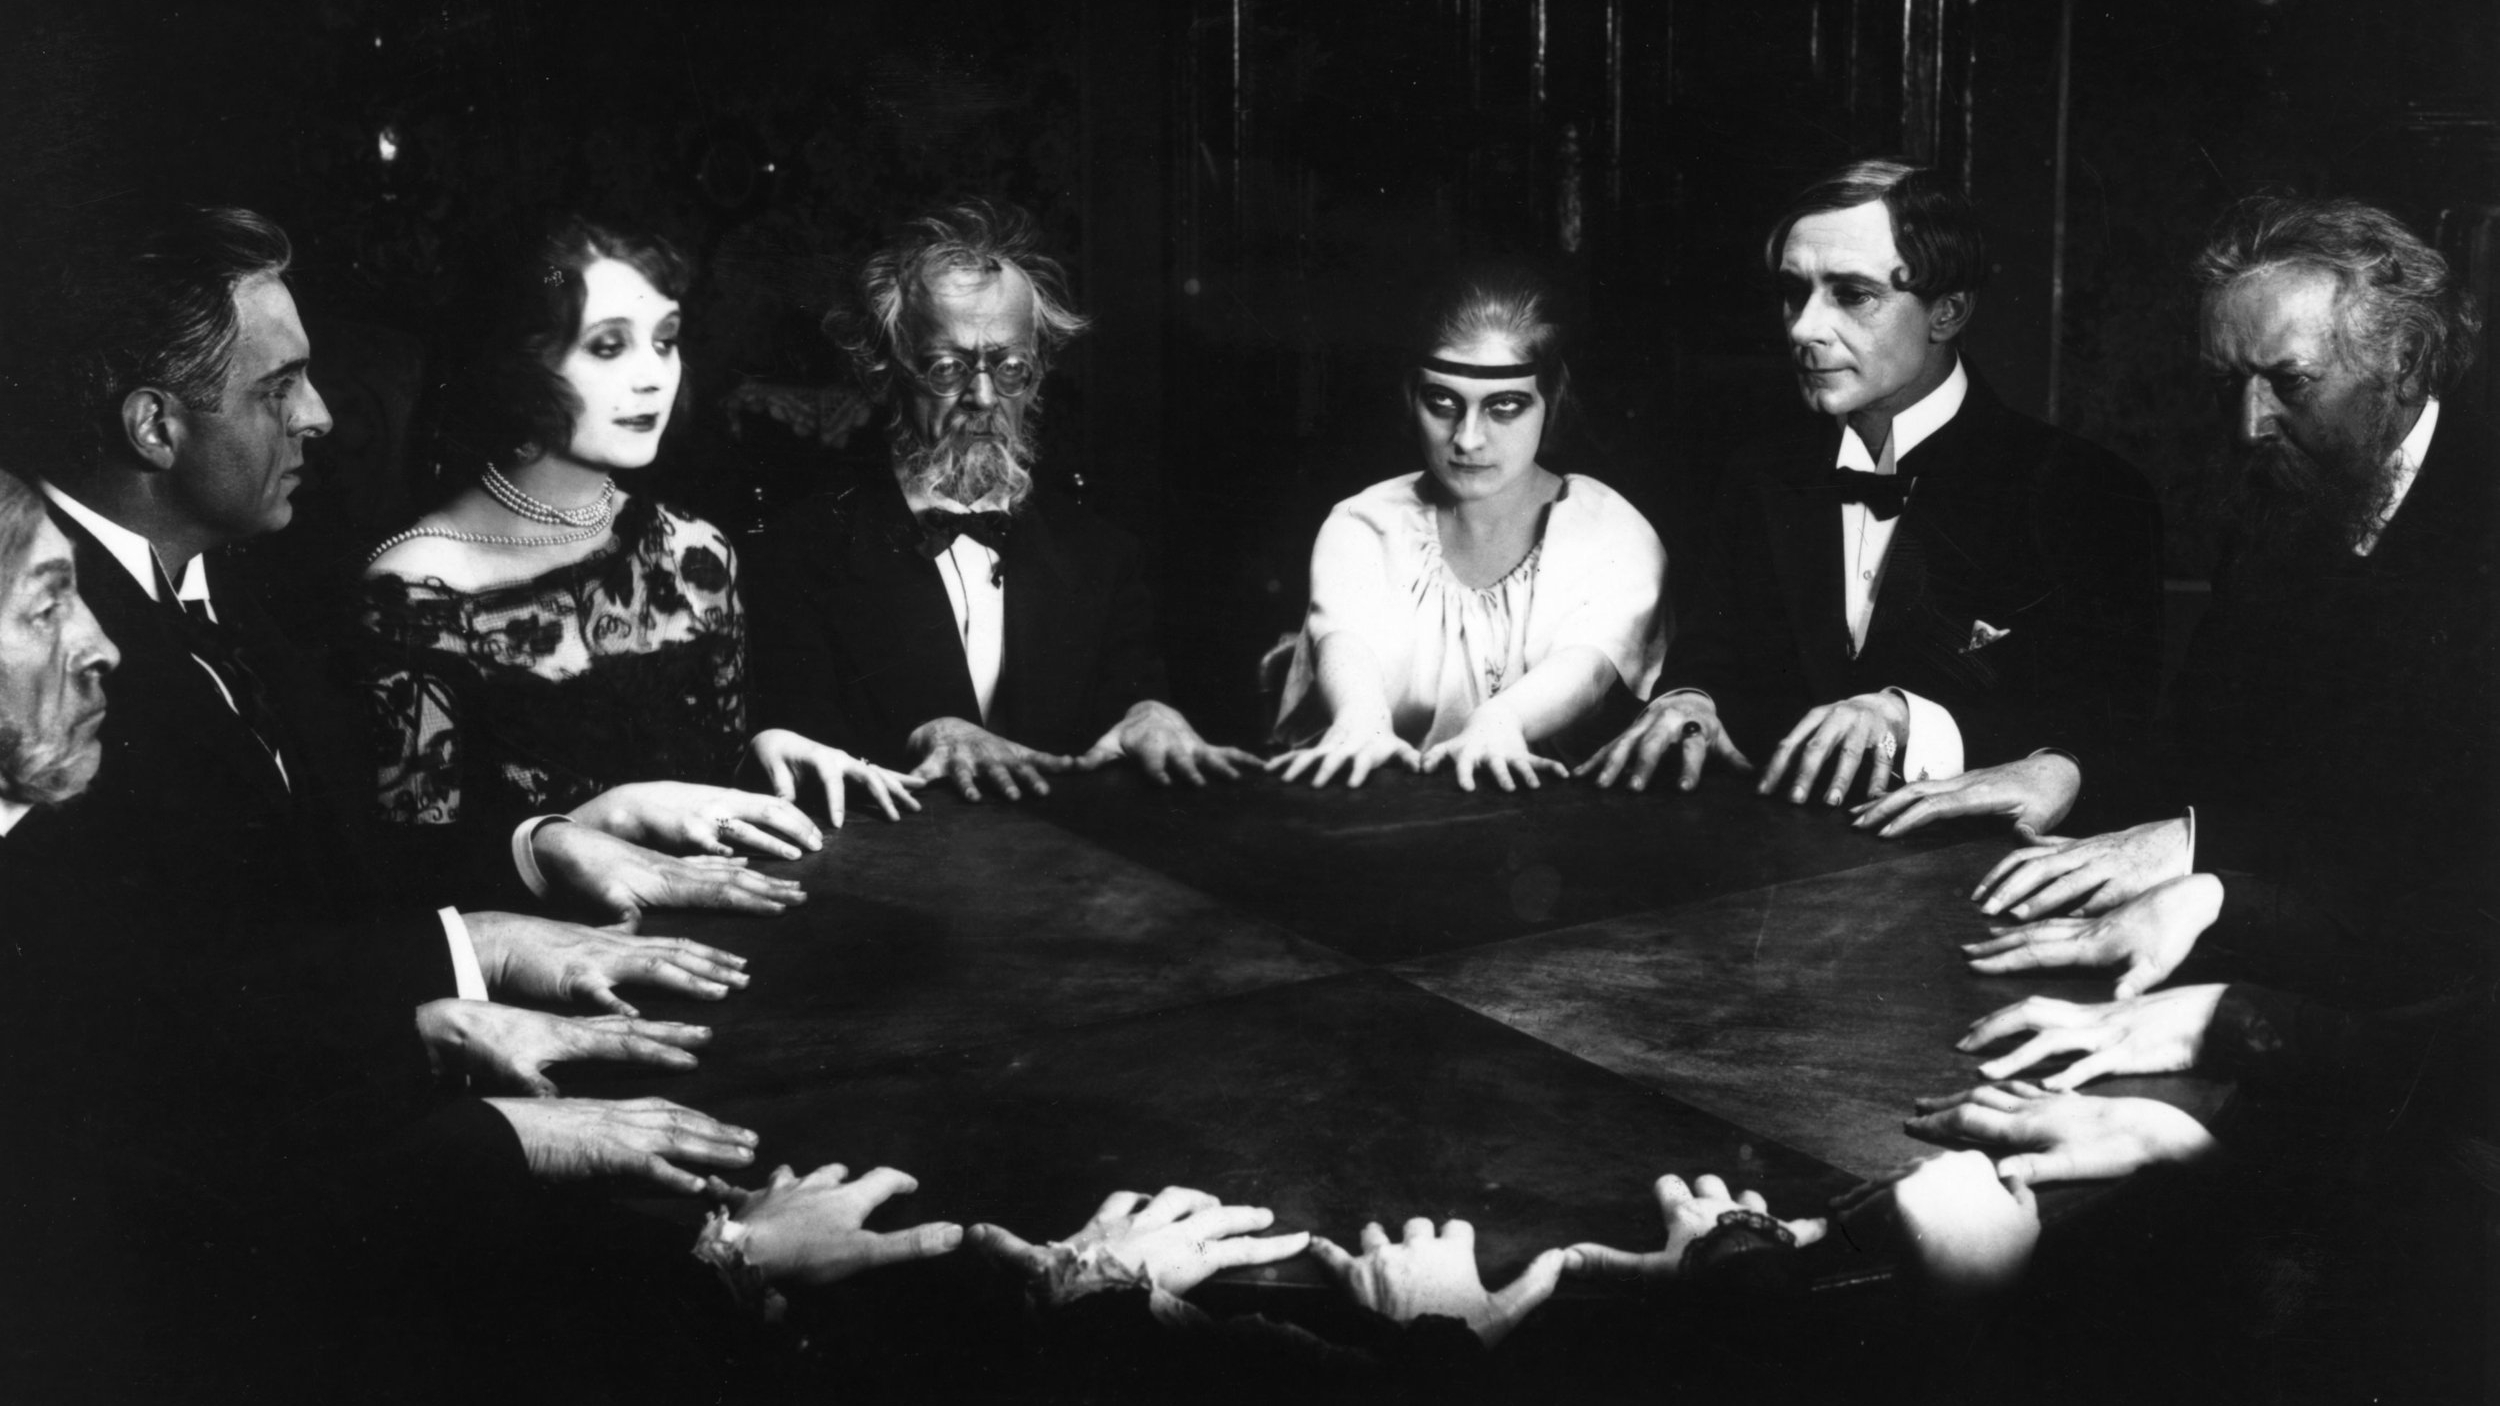 #44) Dr. Mabuse, der Spieler - (1922 - dir. Fritz Lang)